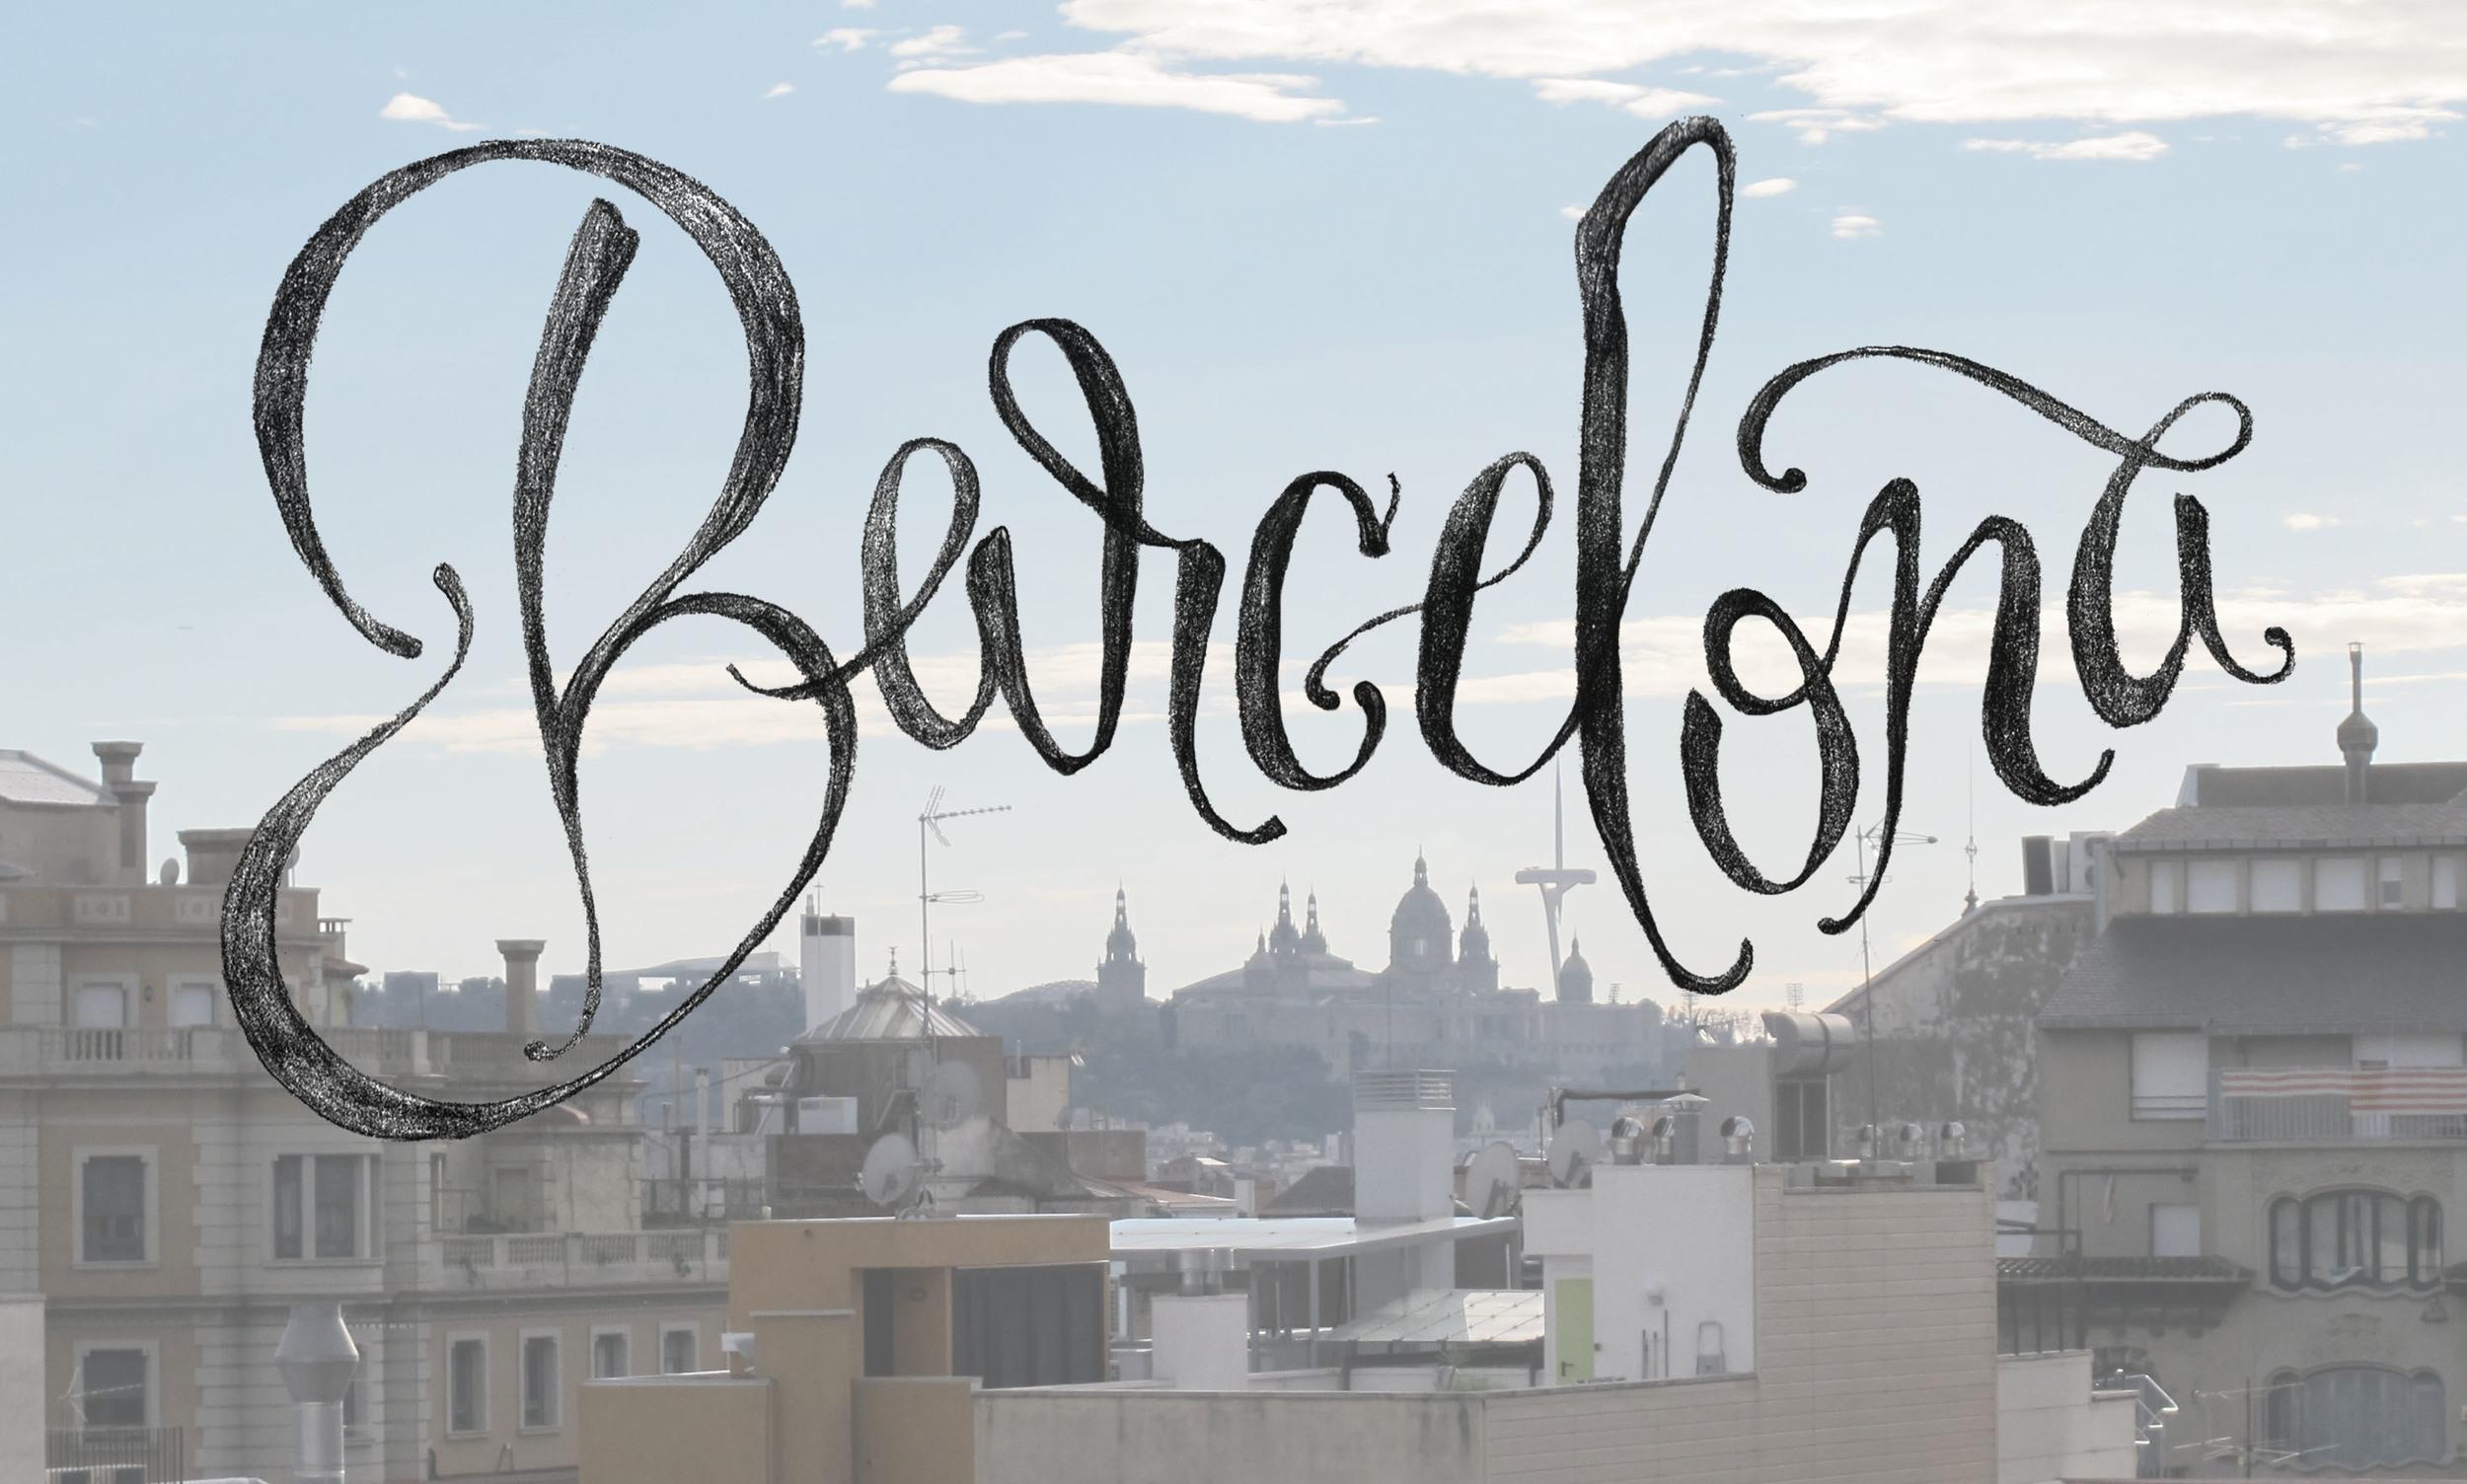 barcelona image.jpg